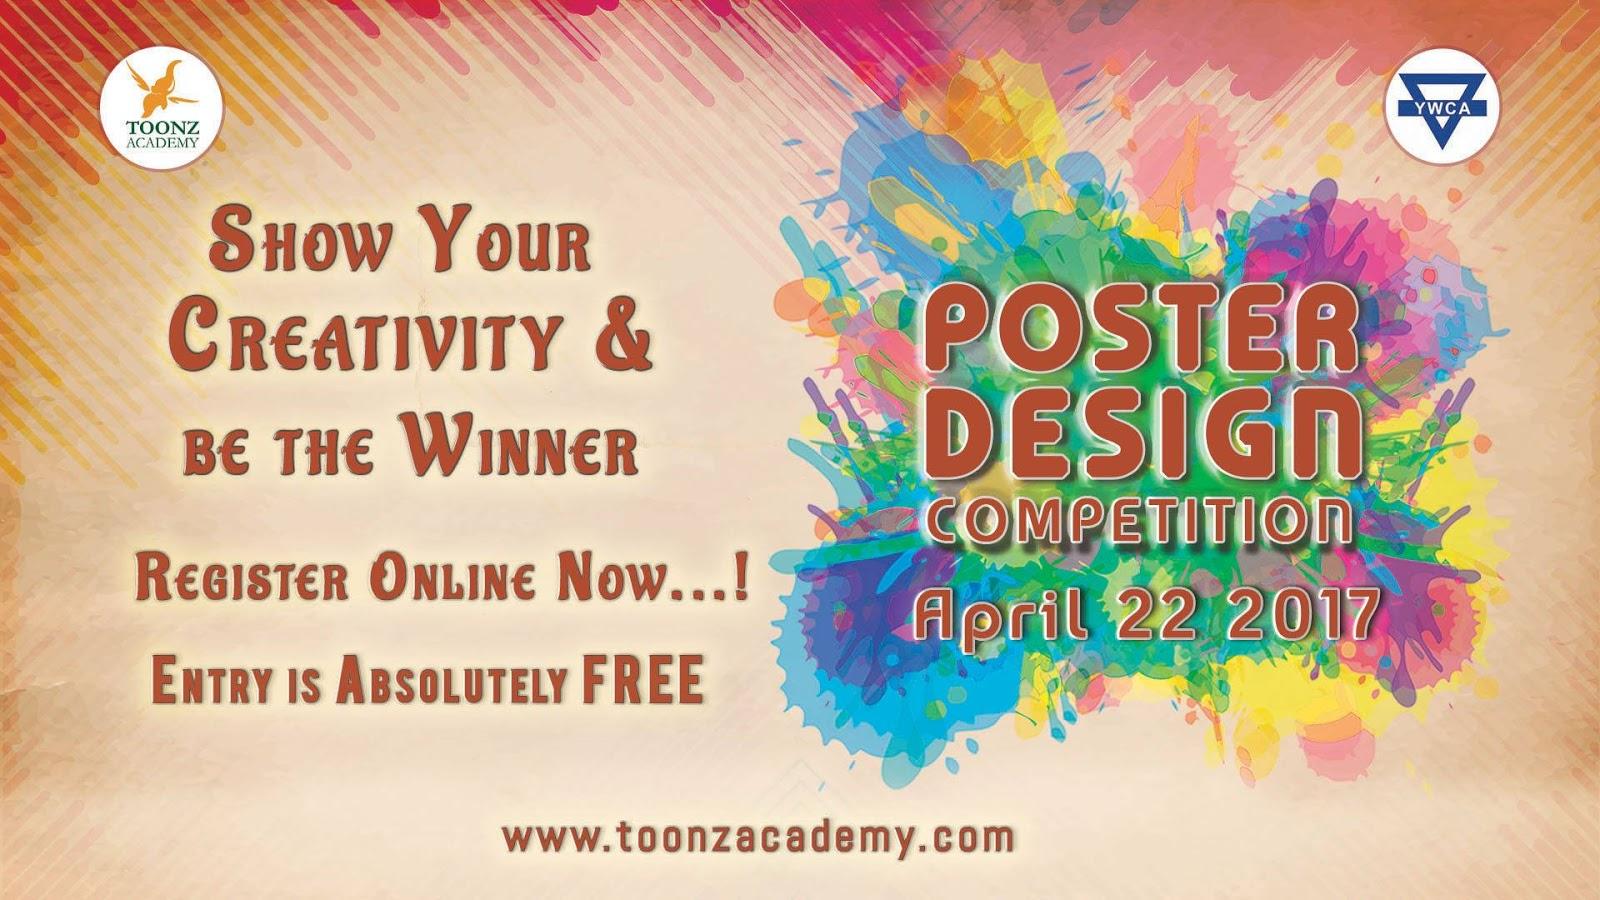 Poster design competition 2017 - Poster Design Contest 2017 Poster Design Competition 2017 Toonz Academy Ywca